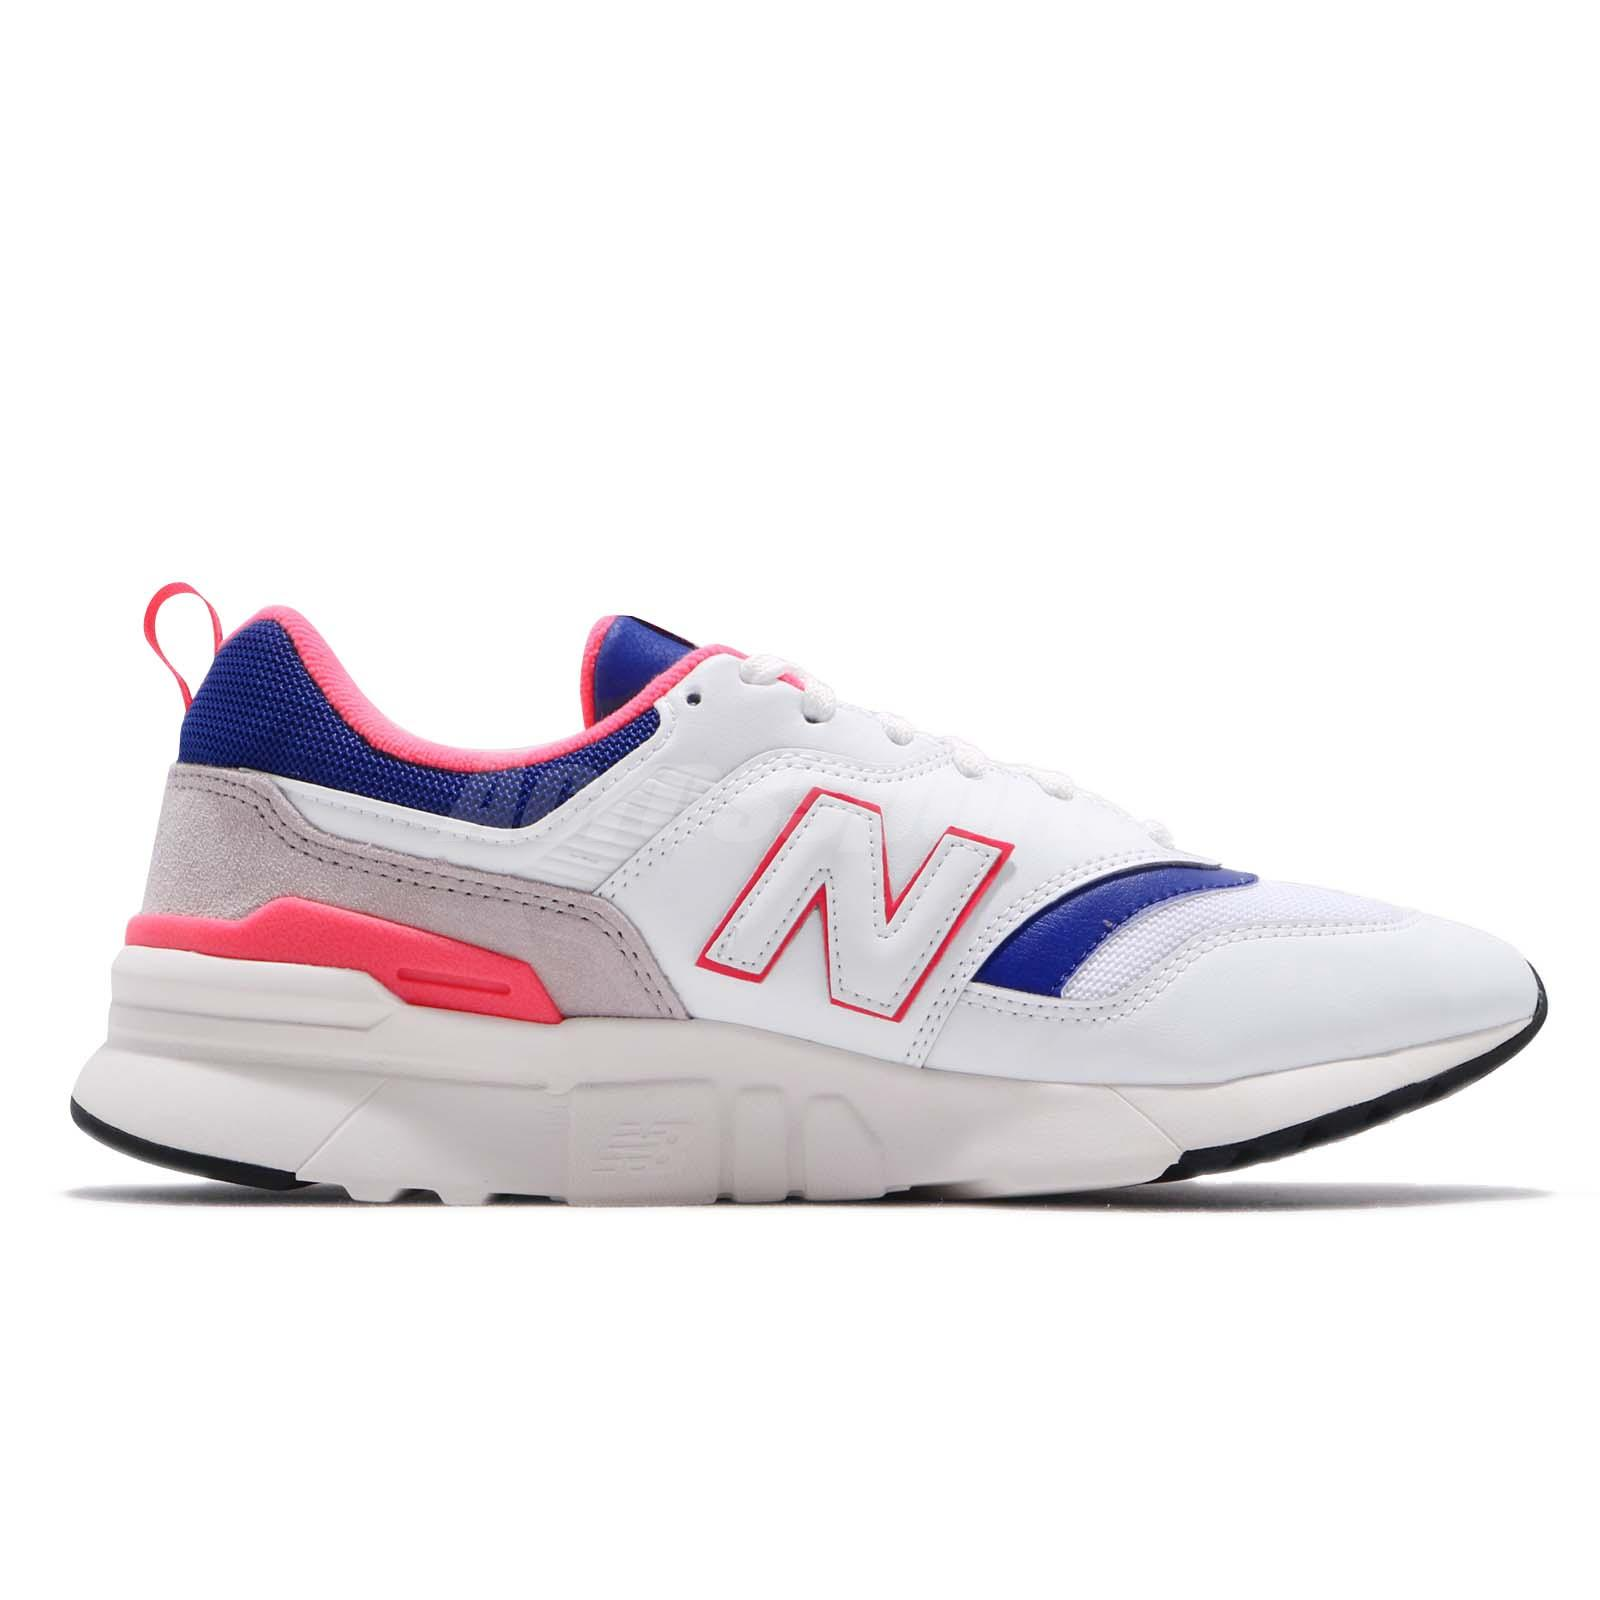 New Balance CM997HAJ D White Blue Pink